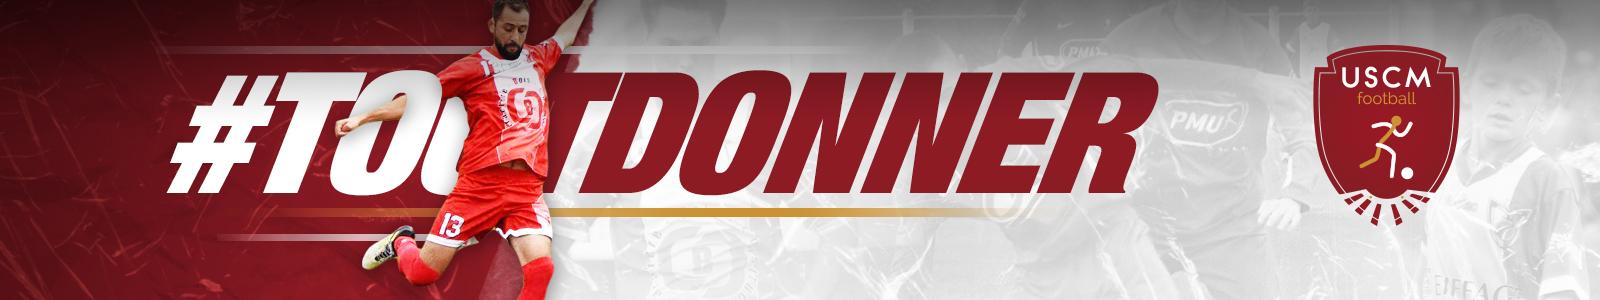 USC Mezidon Football : site officiel du club de foot de MEZIDON CANON - footeo